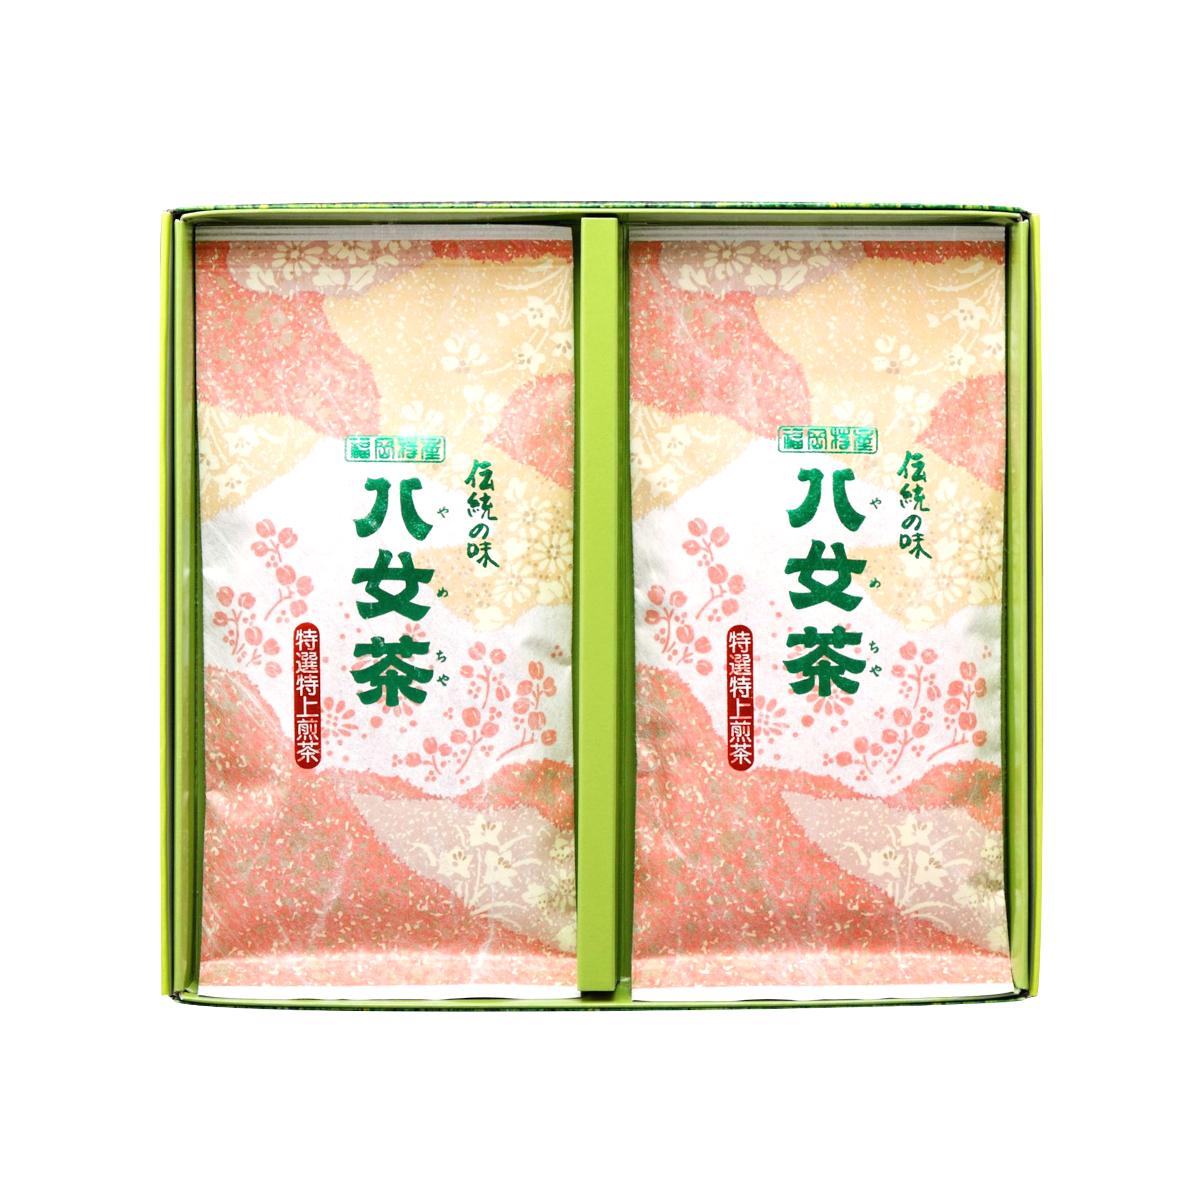 【G-220・サ】特選特上煎茶 100g×2袋ギフト